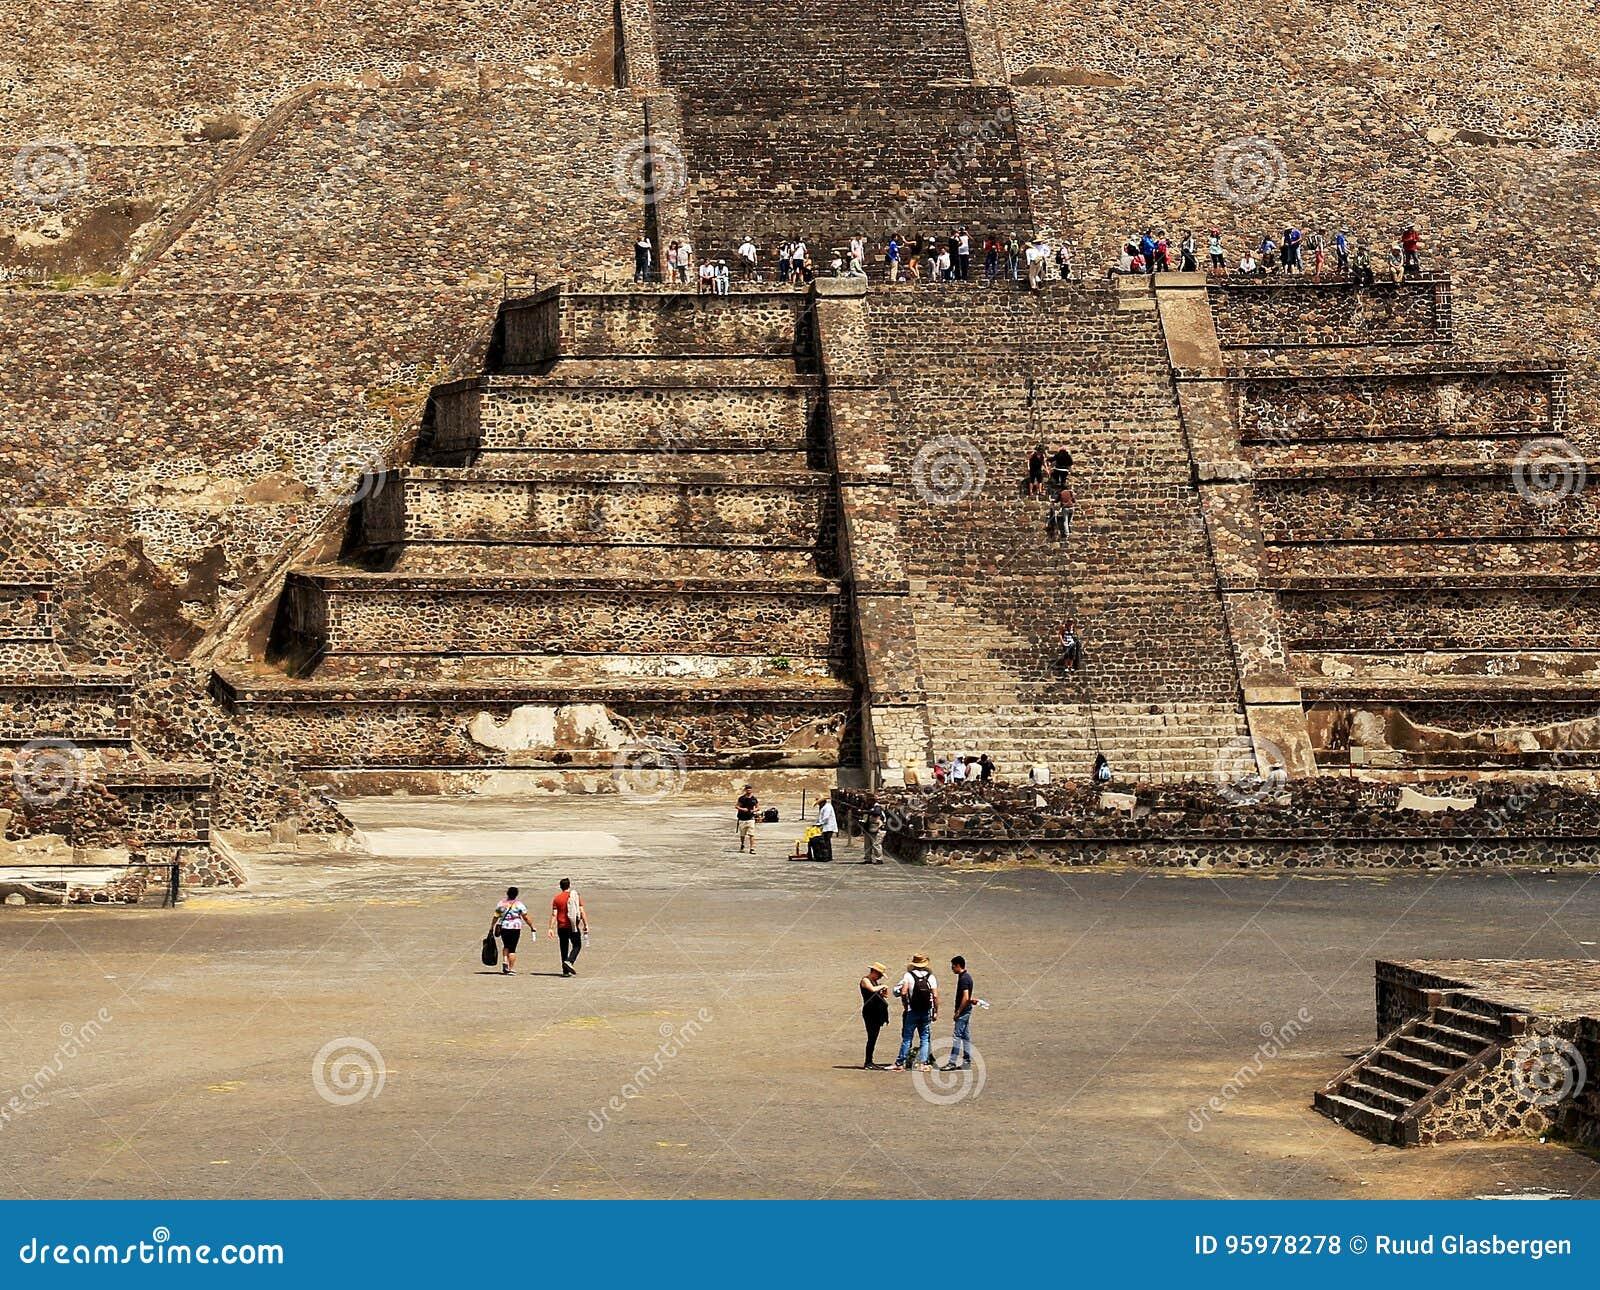 Vele toerist op de Piramides van Teotihuacan, Mexico